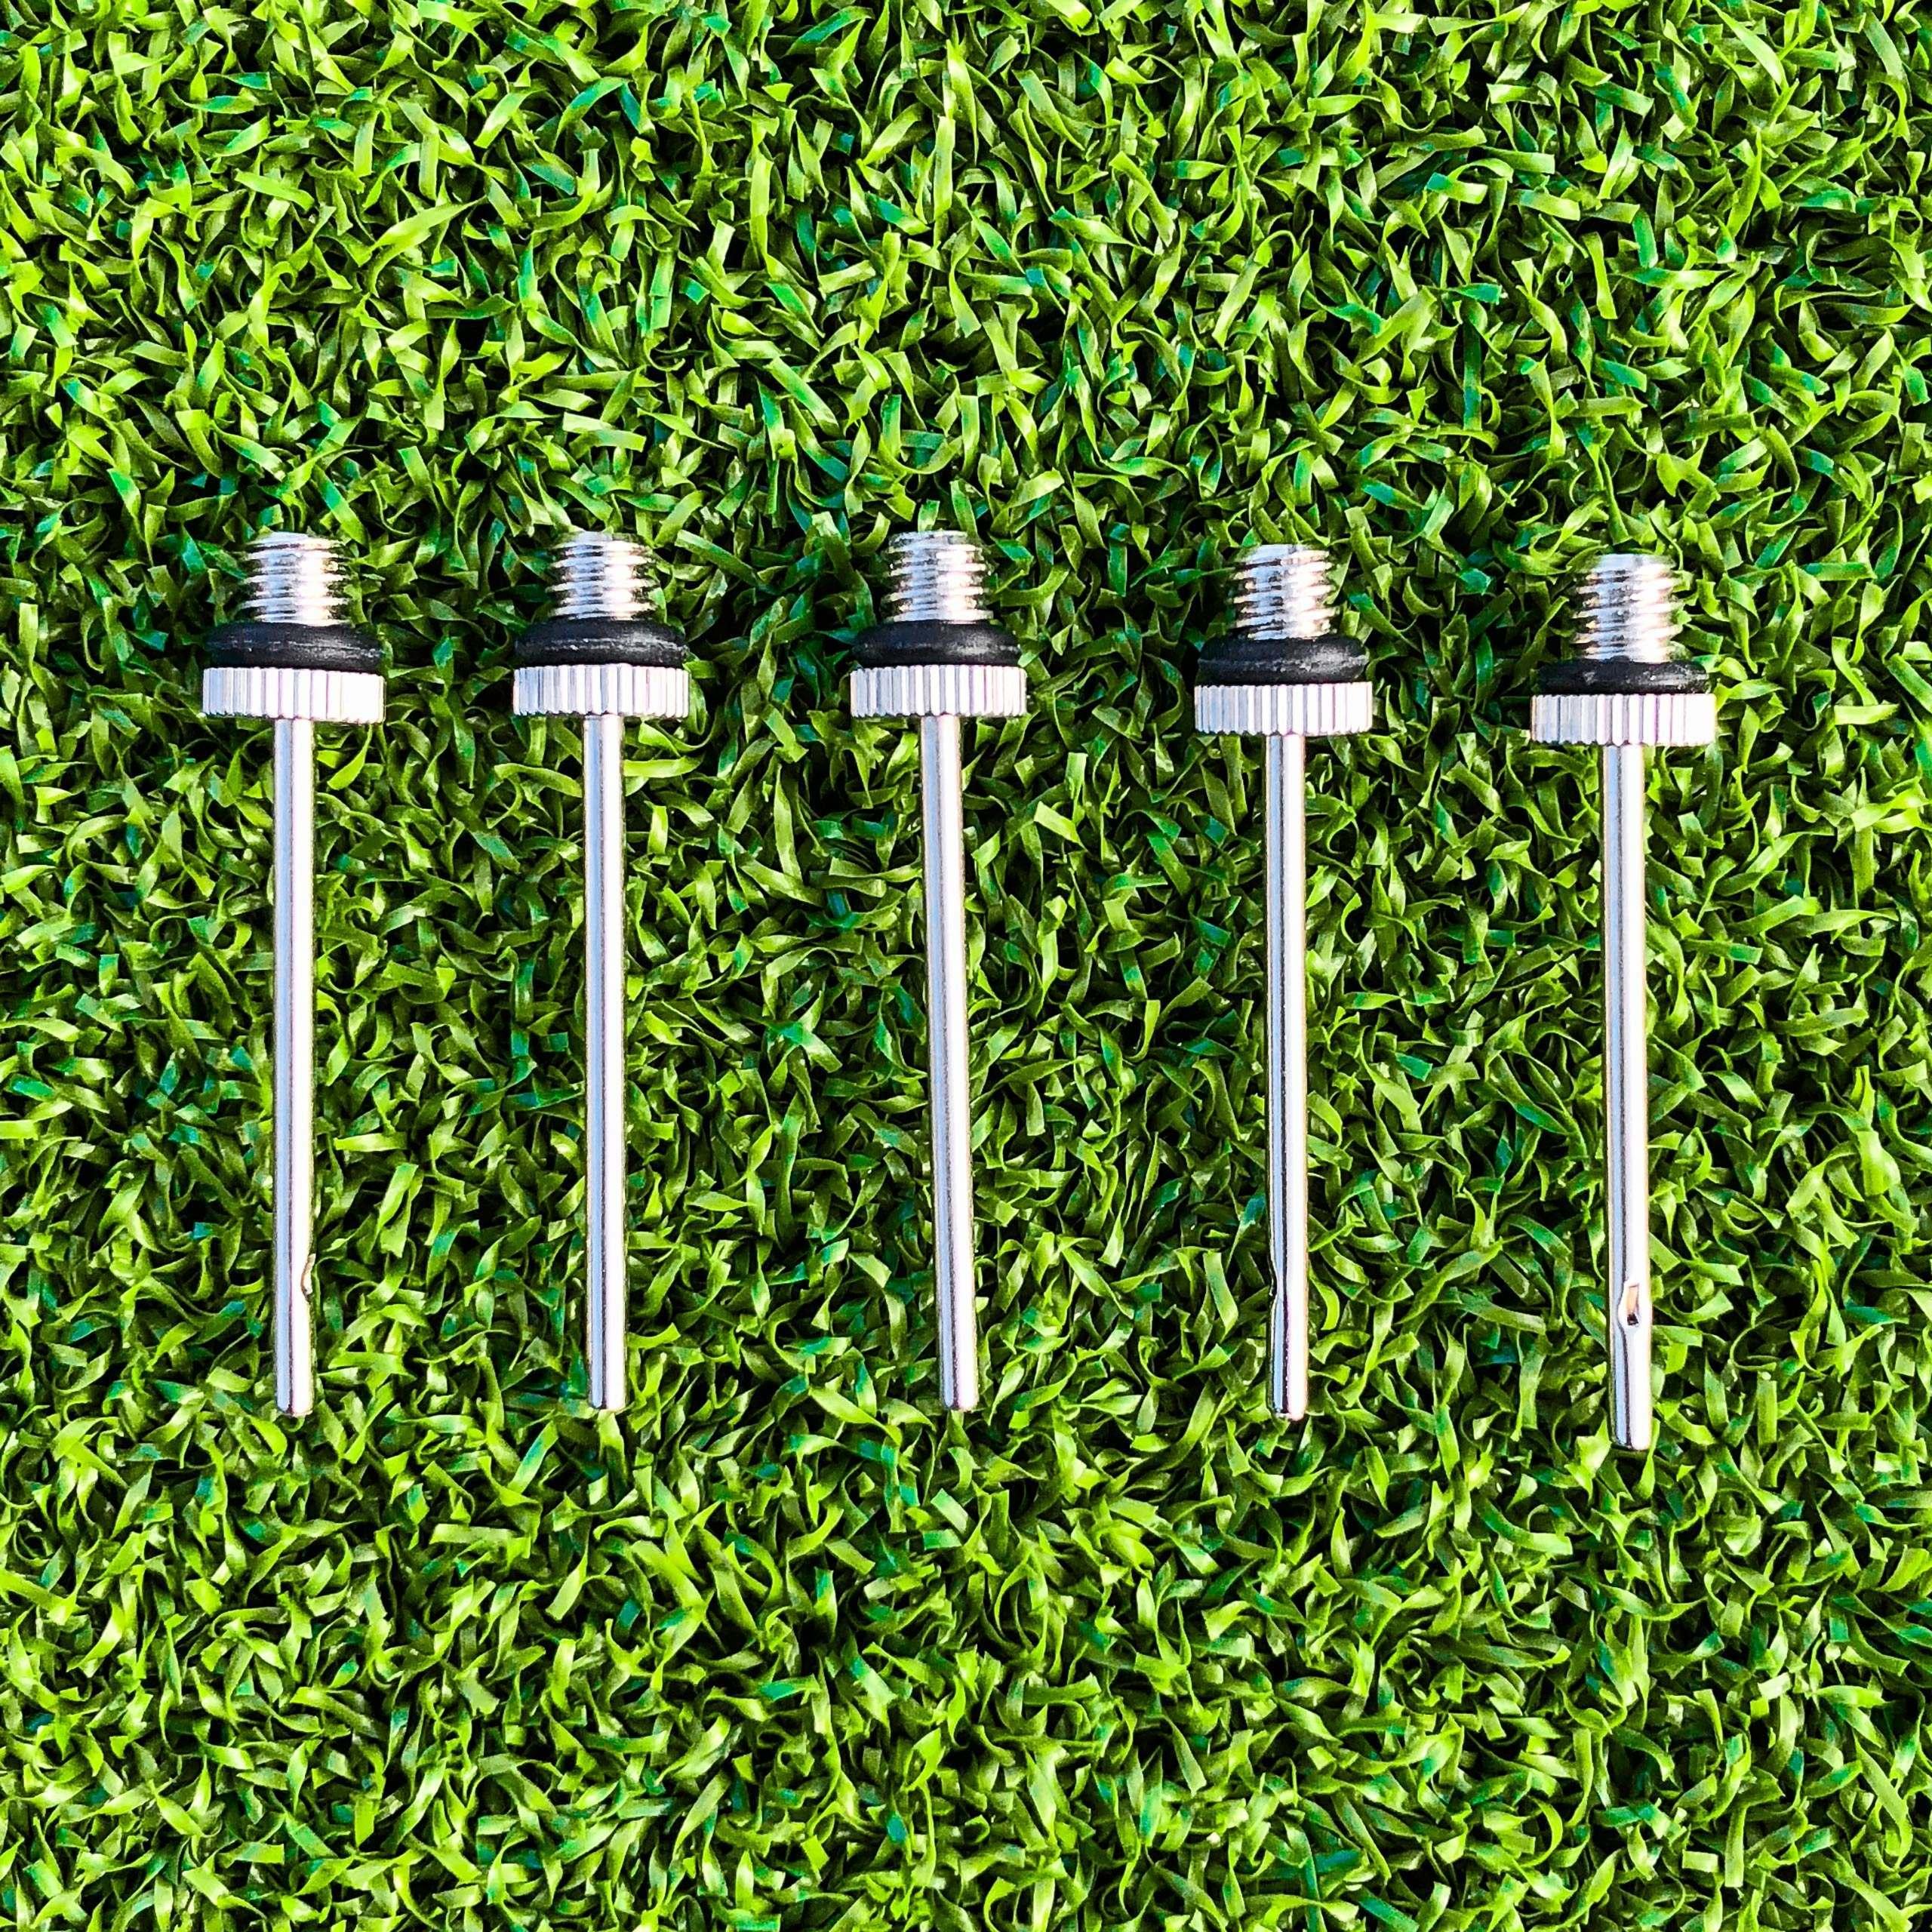 FORZA Needle Valves Football Ball Pump Needles 5 Pack